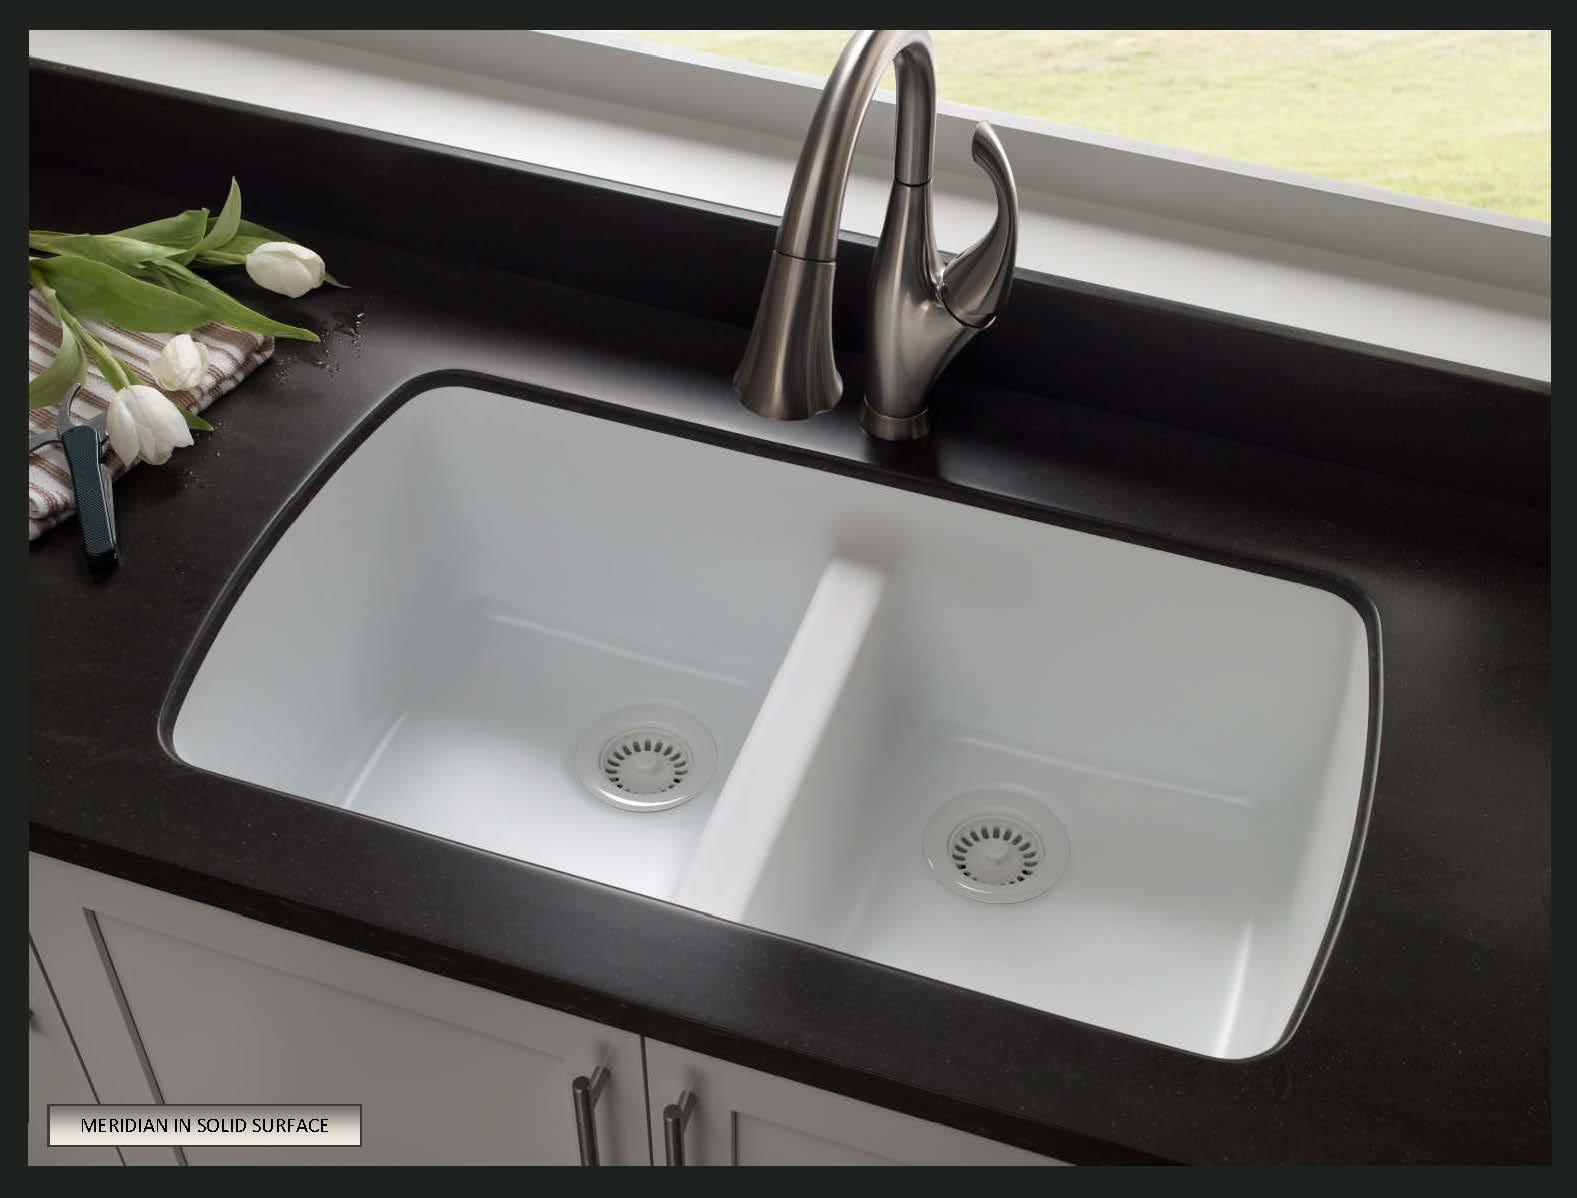 choose sink solid surface countertops corian kitchen countertops Karran Seamless Undermount Solid Surface